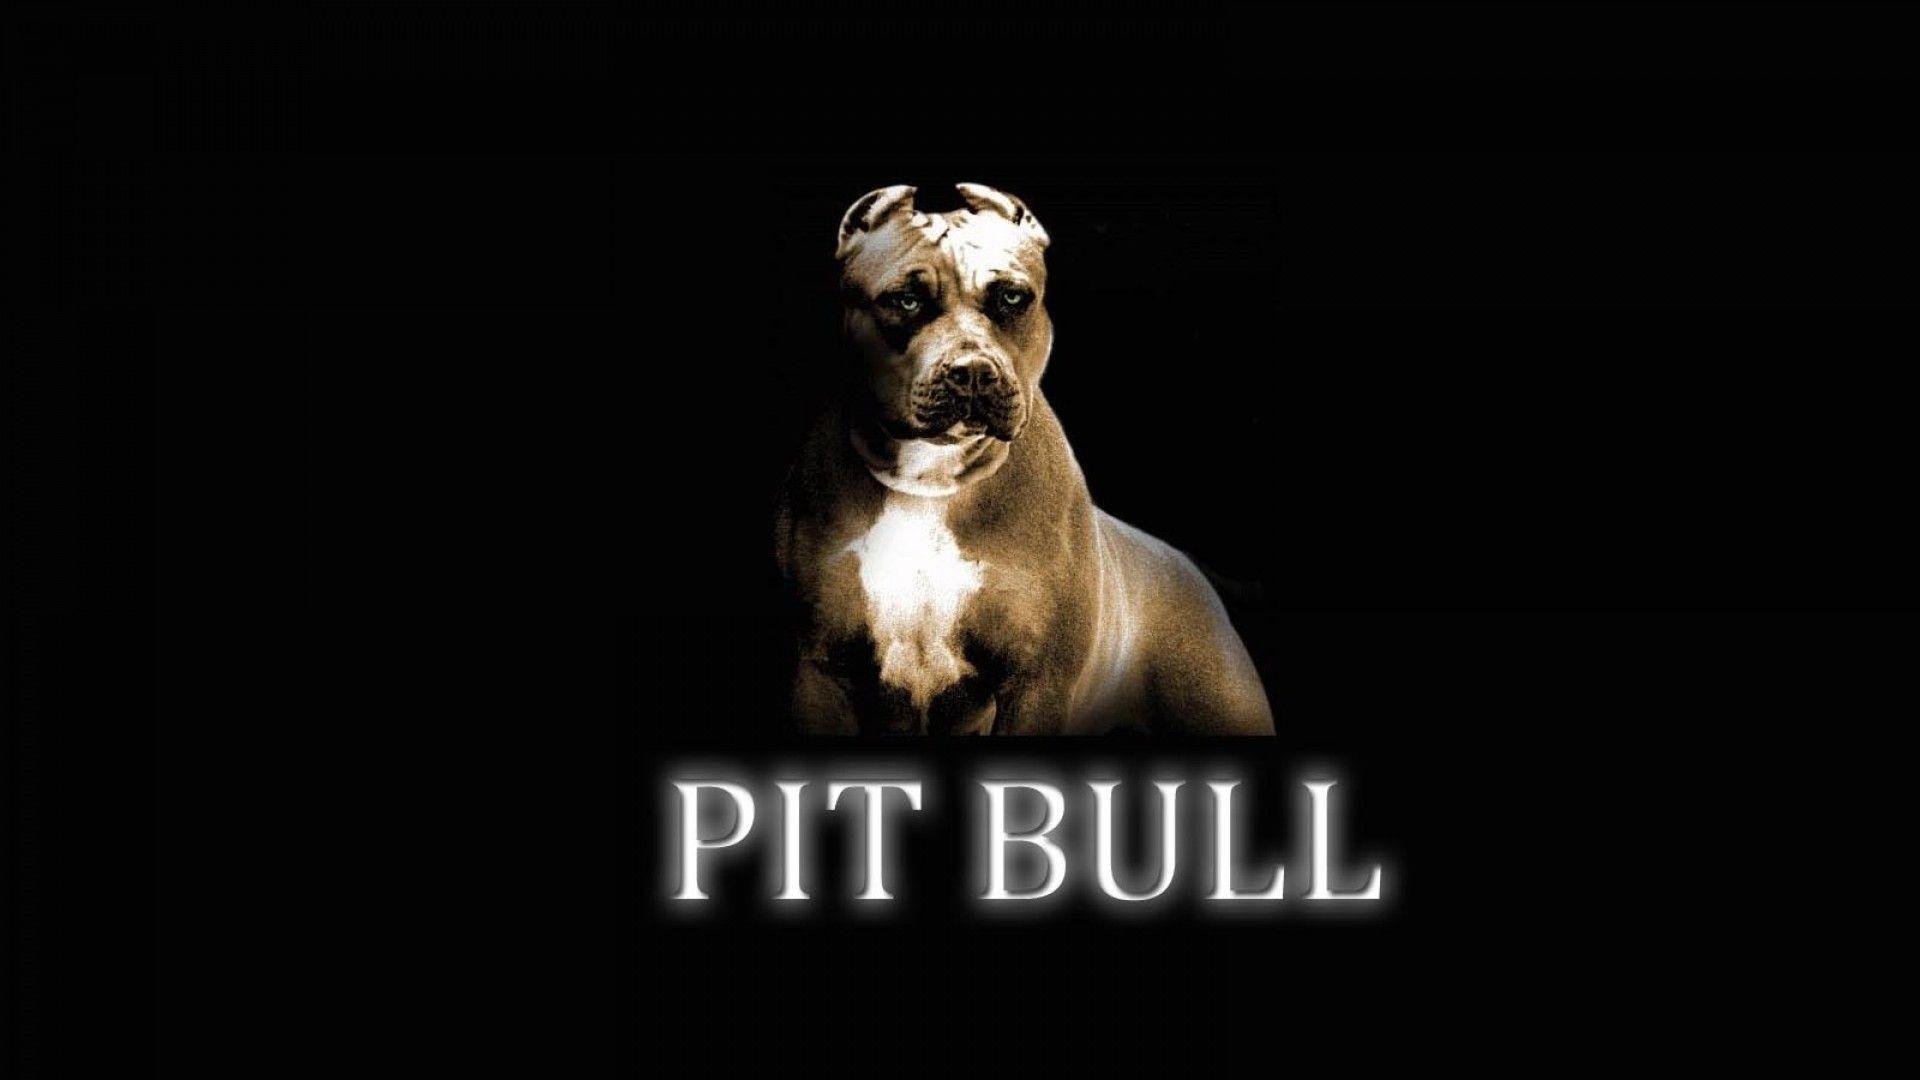 Pitbull Dog Wallpapers Wallpaper